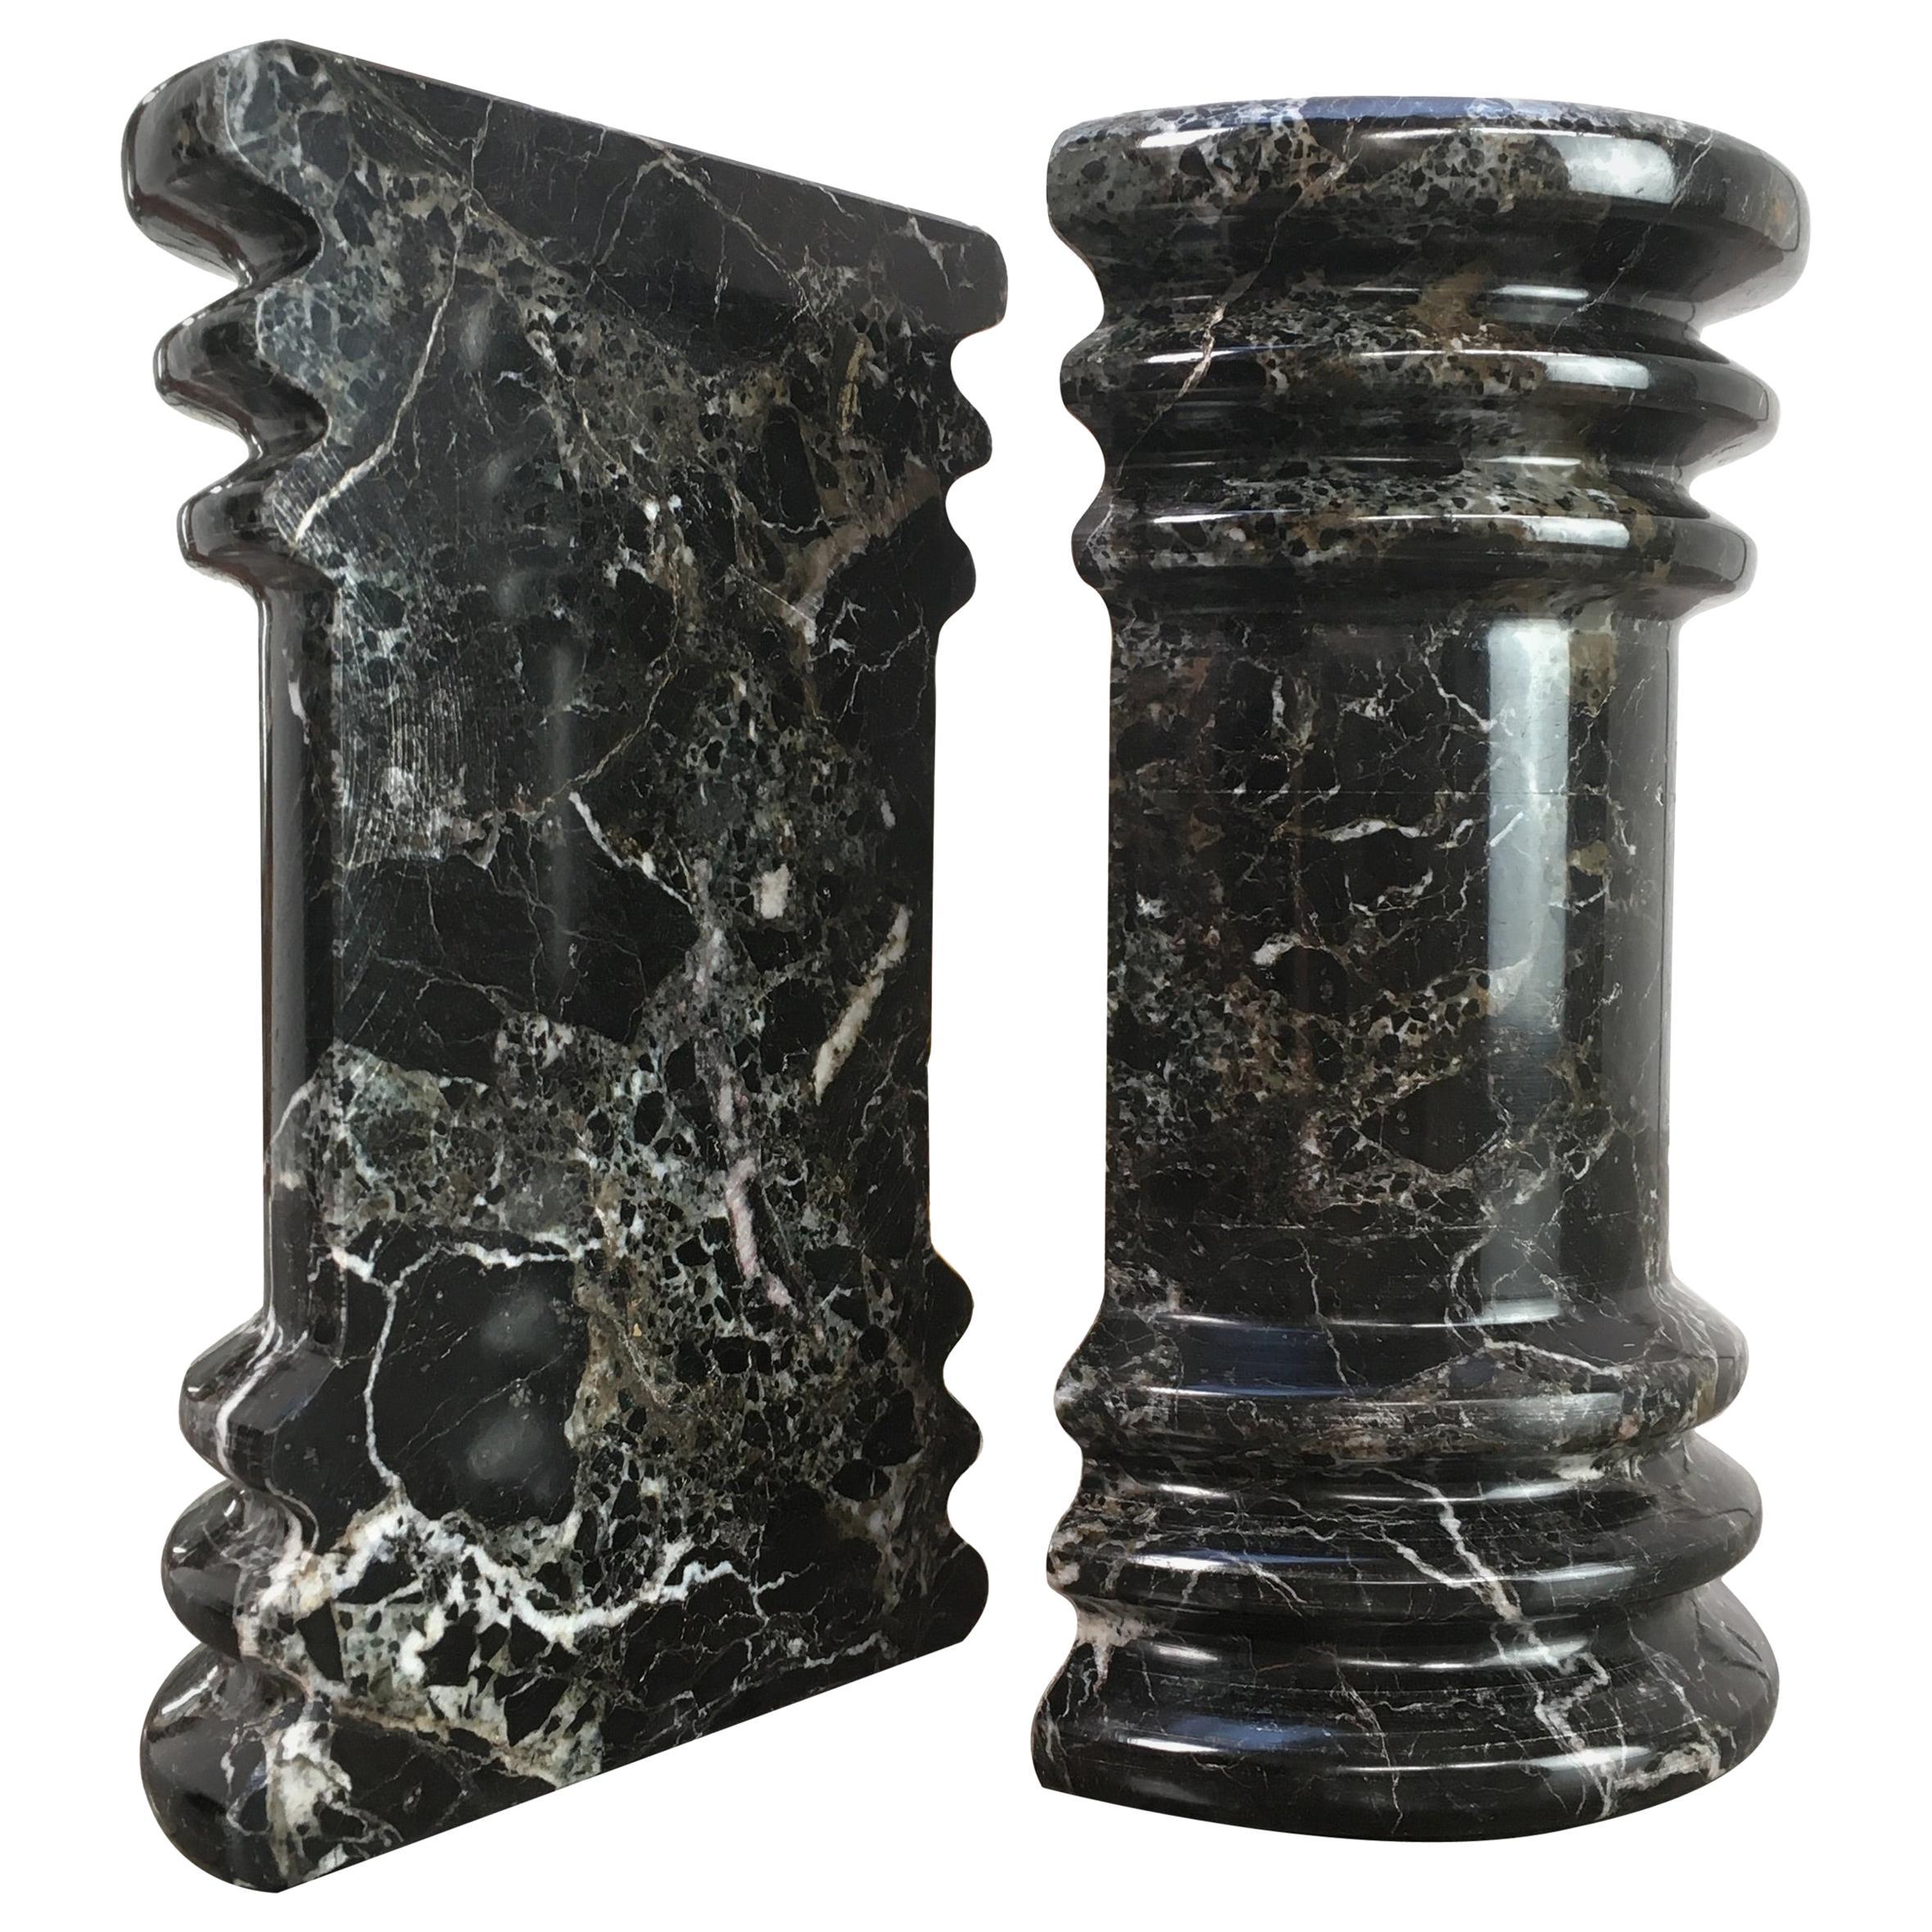 Black White Veined Marble Column Pedestal Bookends 1990s Postmodern Memphis